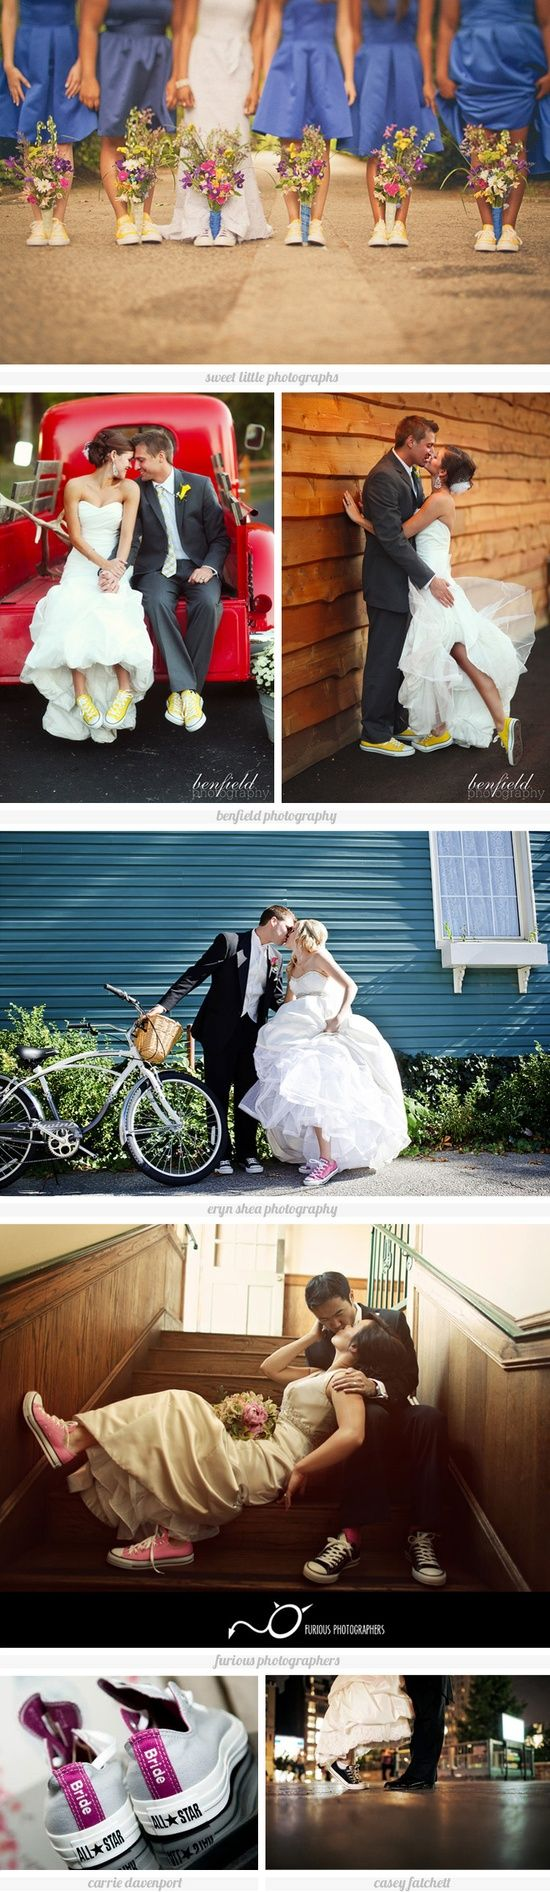 Best 25 Converse wedding shoes ideas on Pinterest